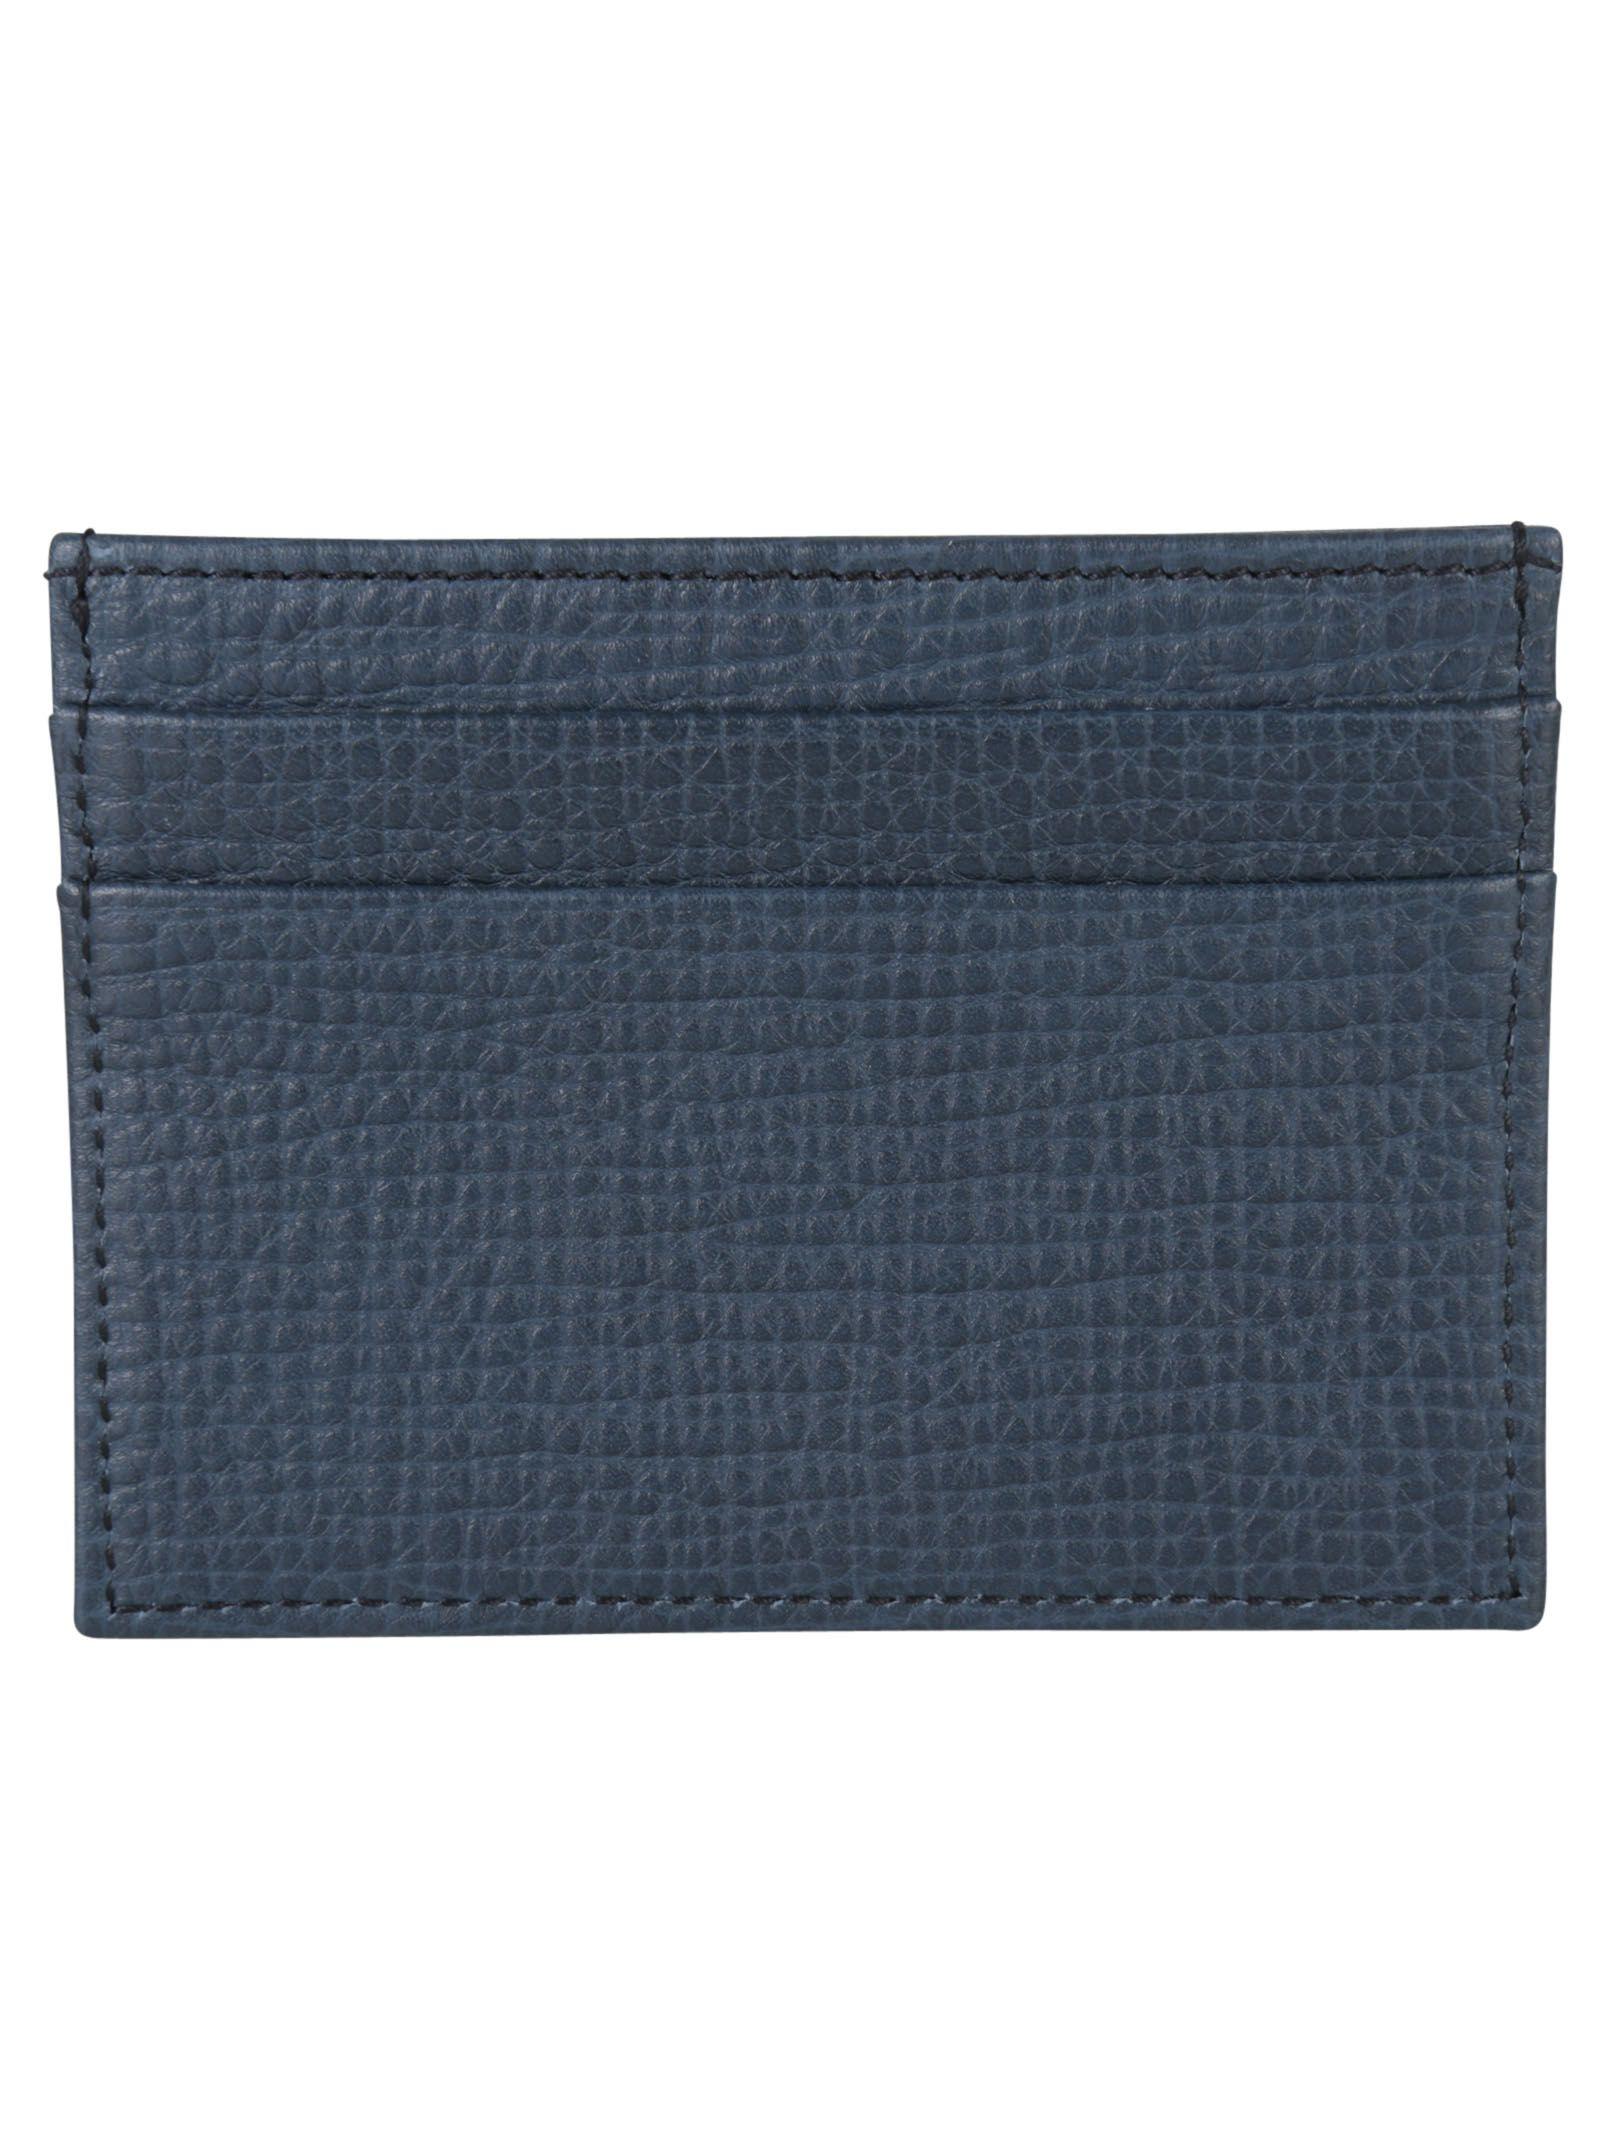 Blue Navy Card Holder